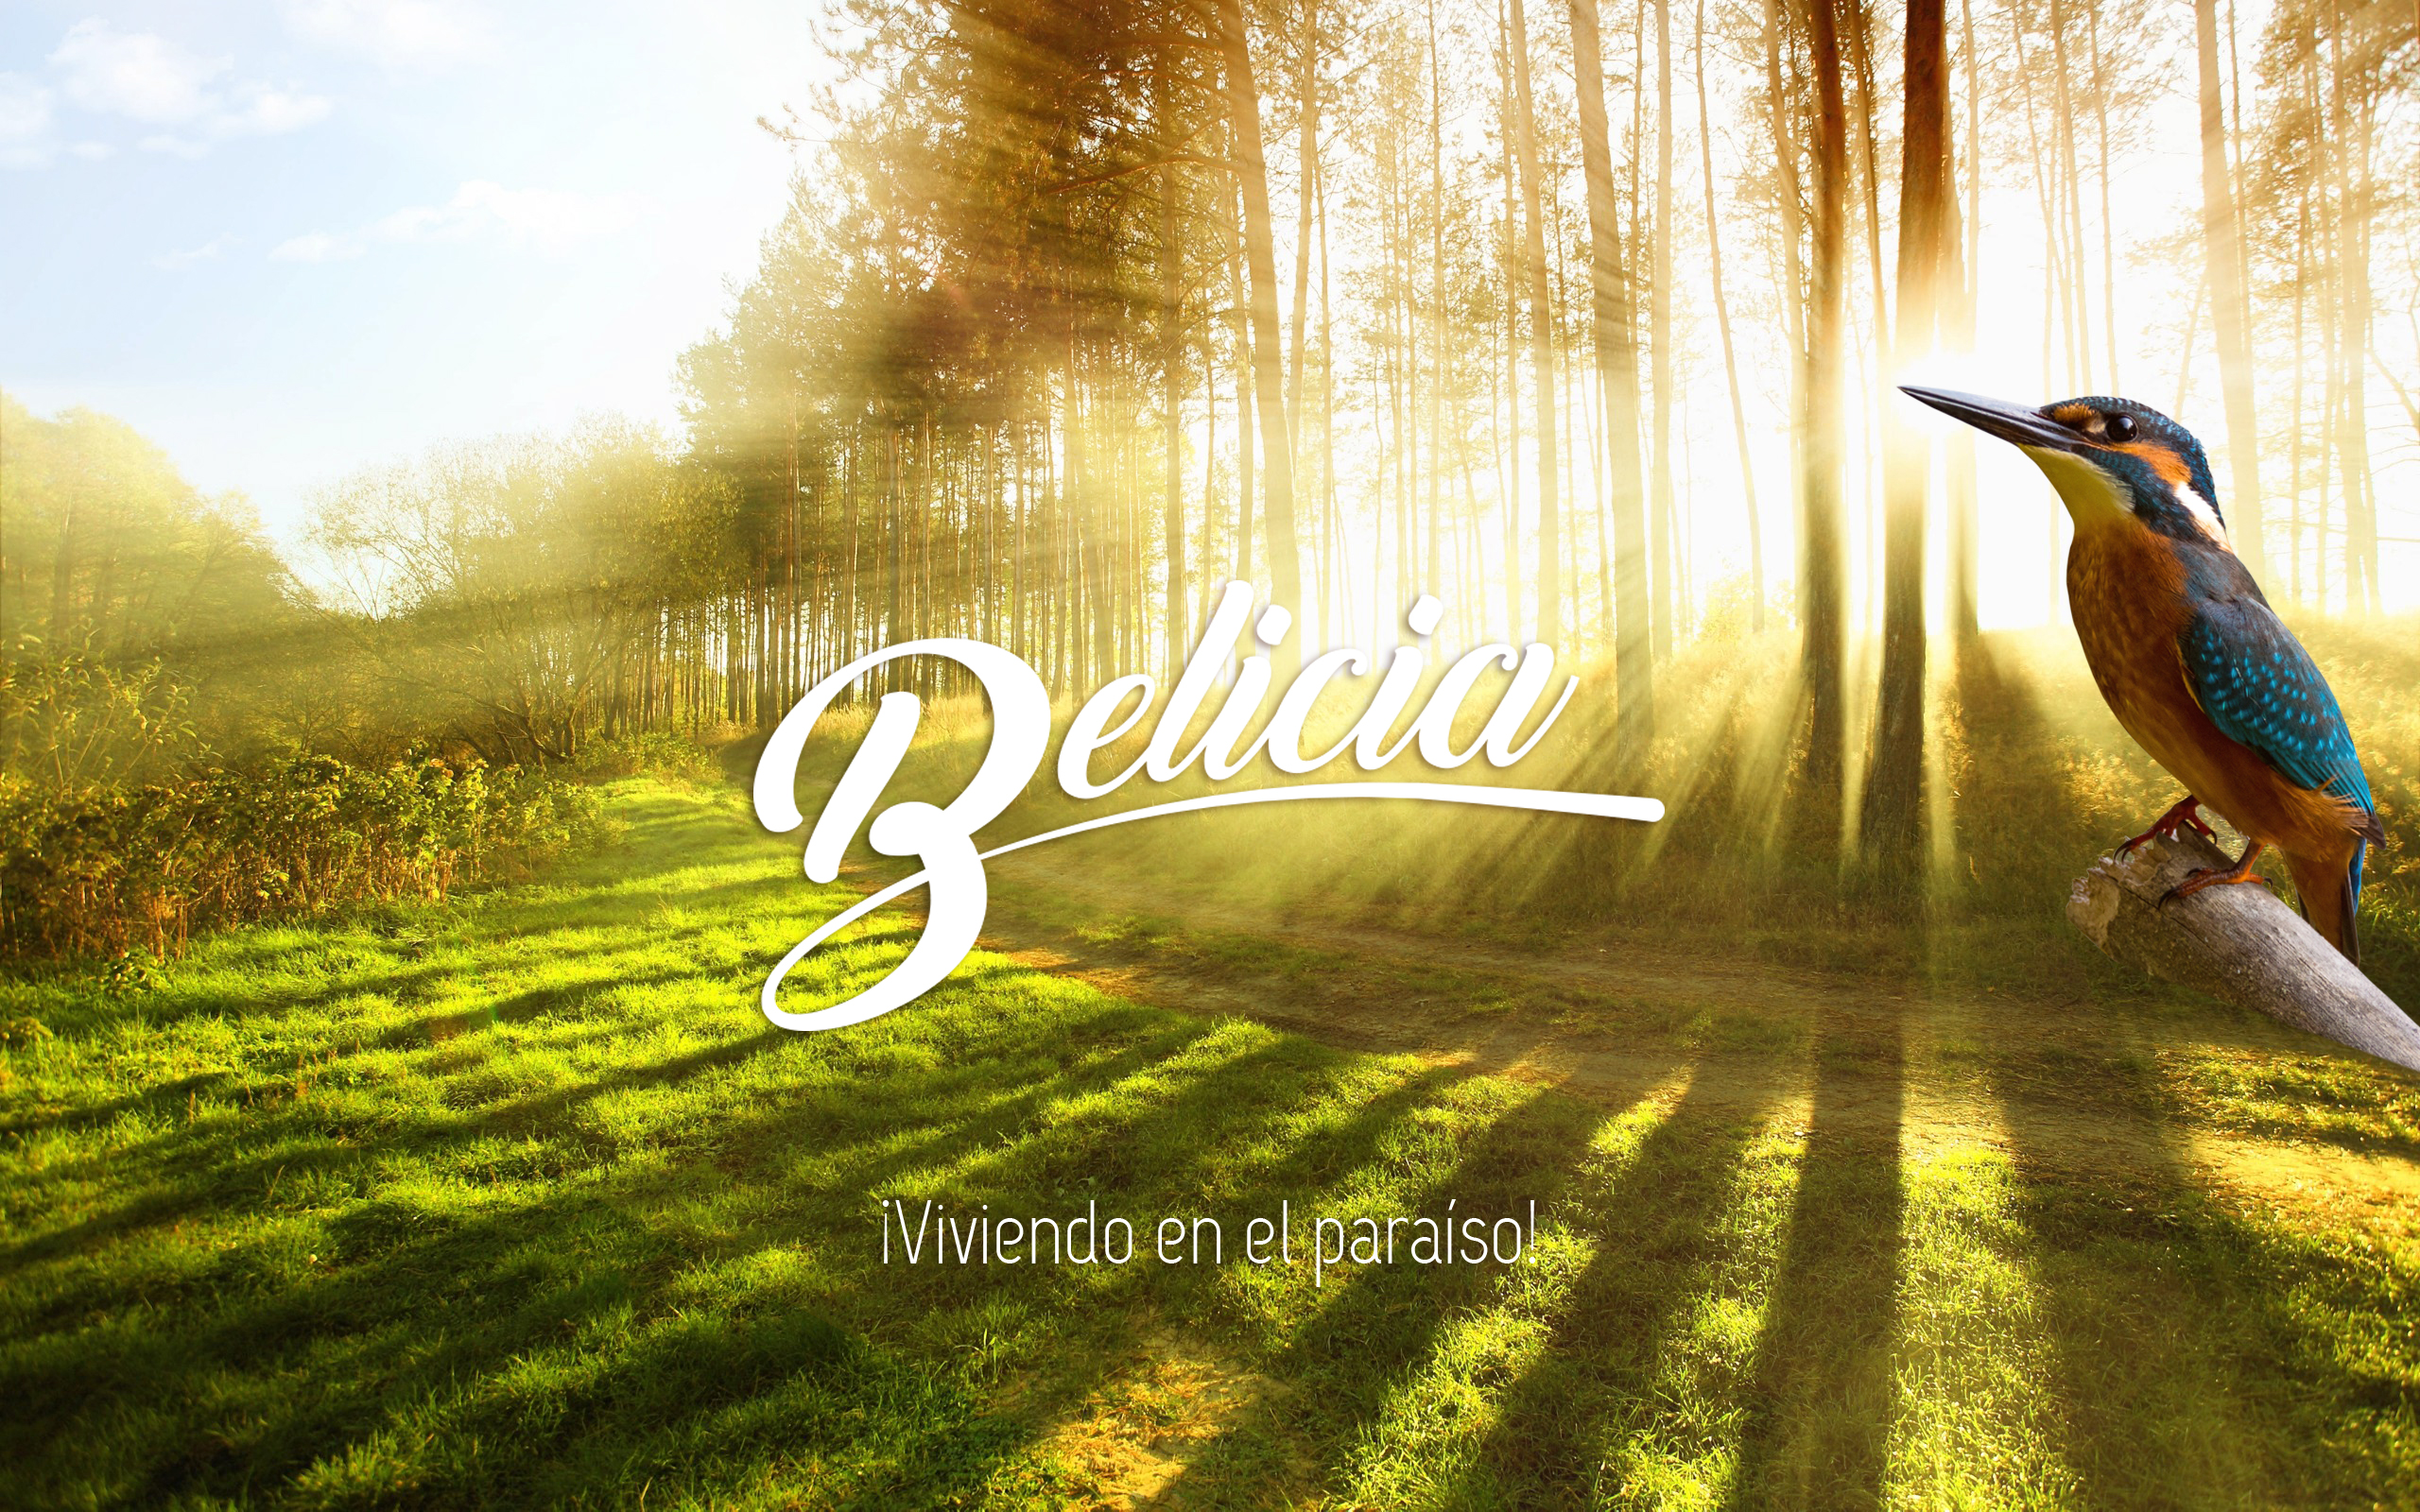 17_08_09_BG_Belicia